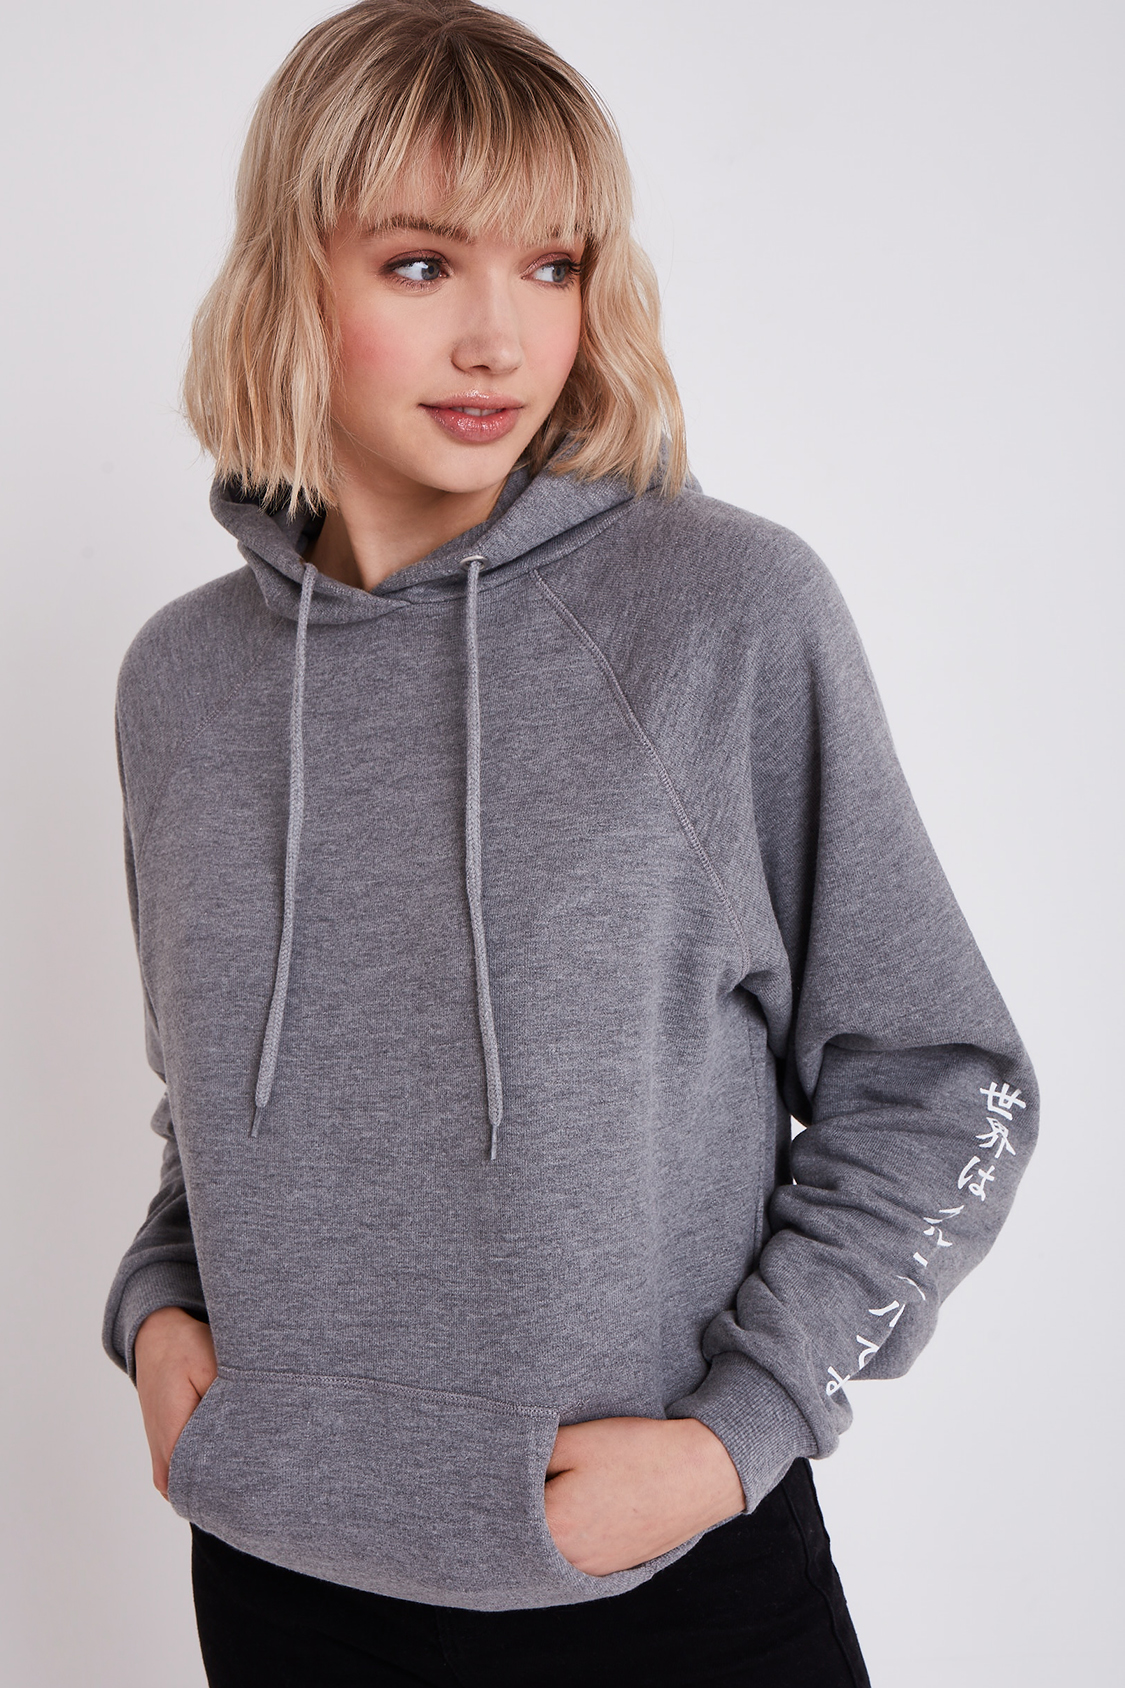 201d6e0cd Hoodies & sweats - Collection